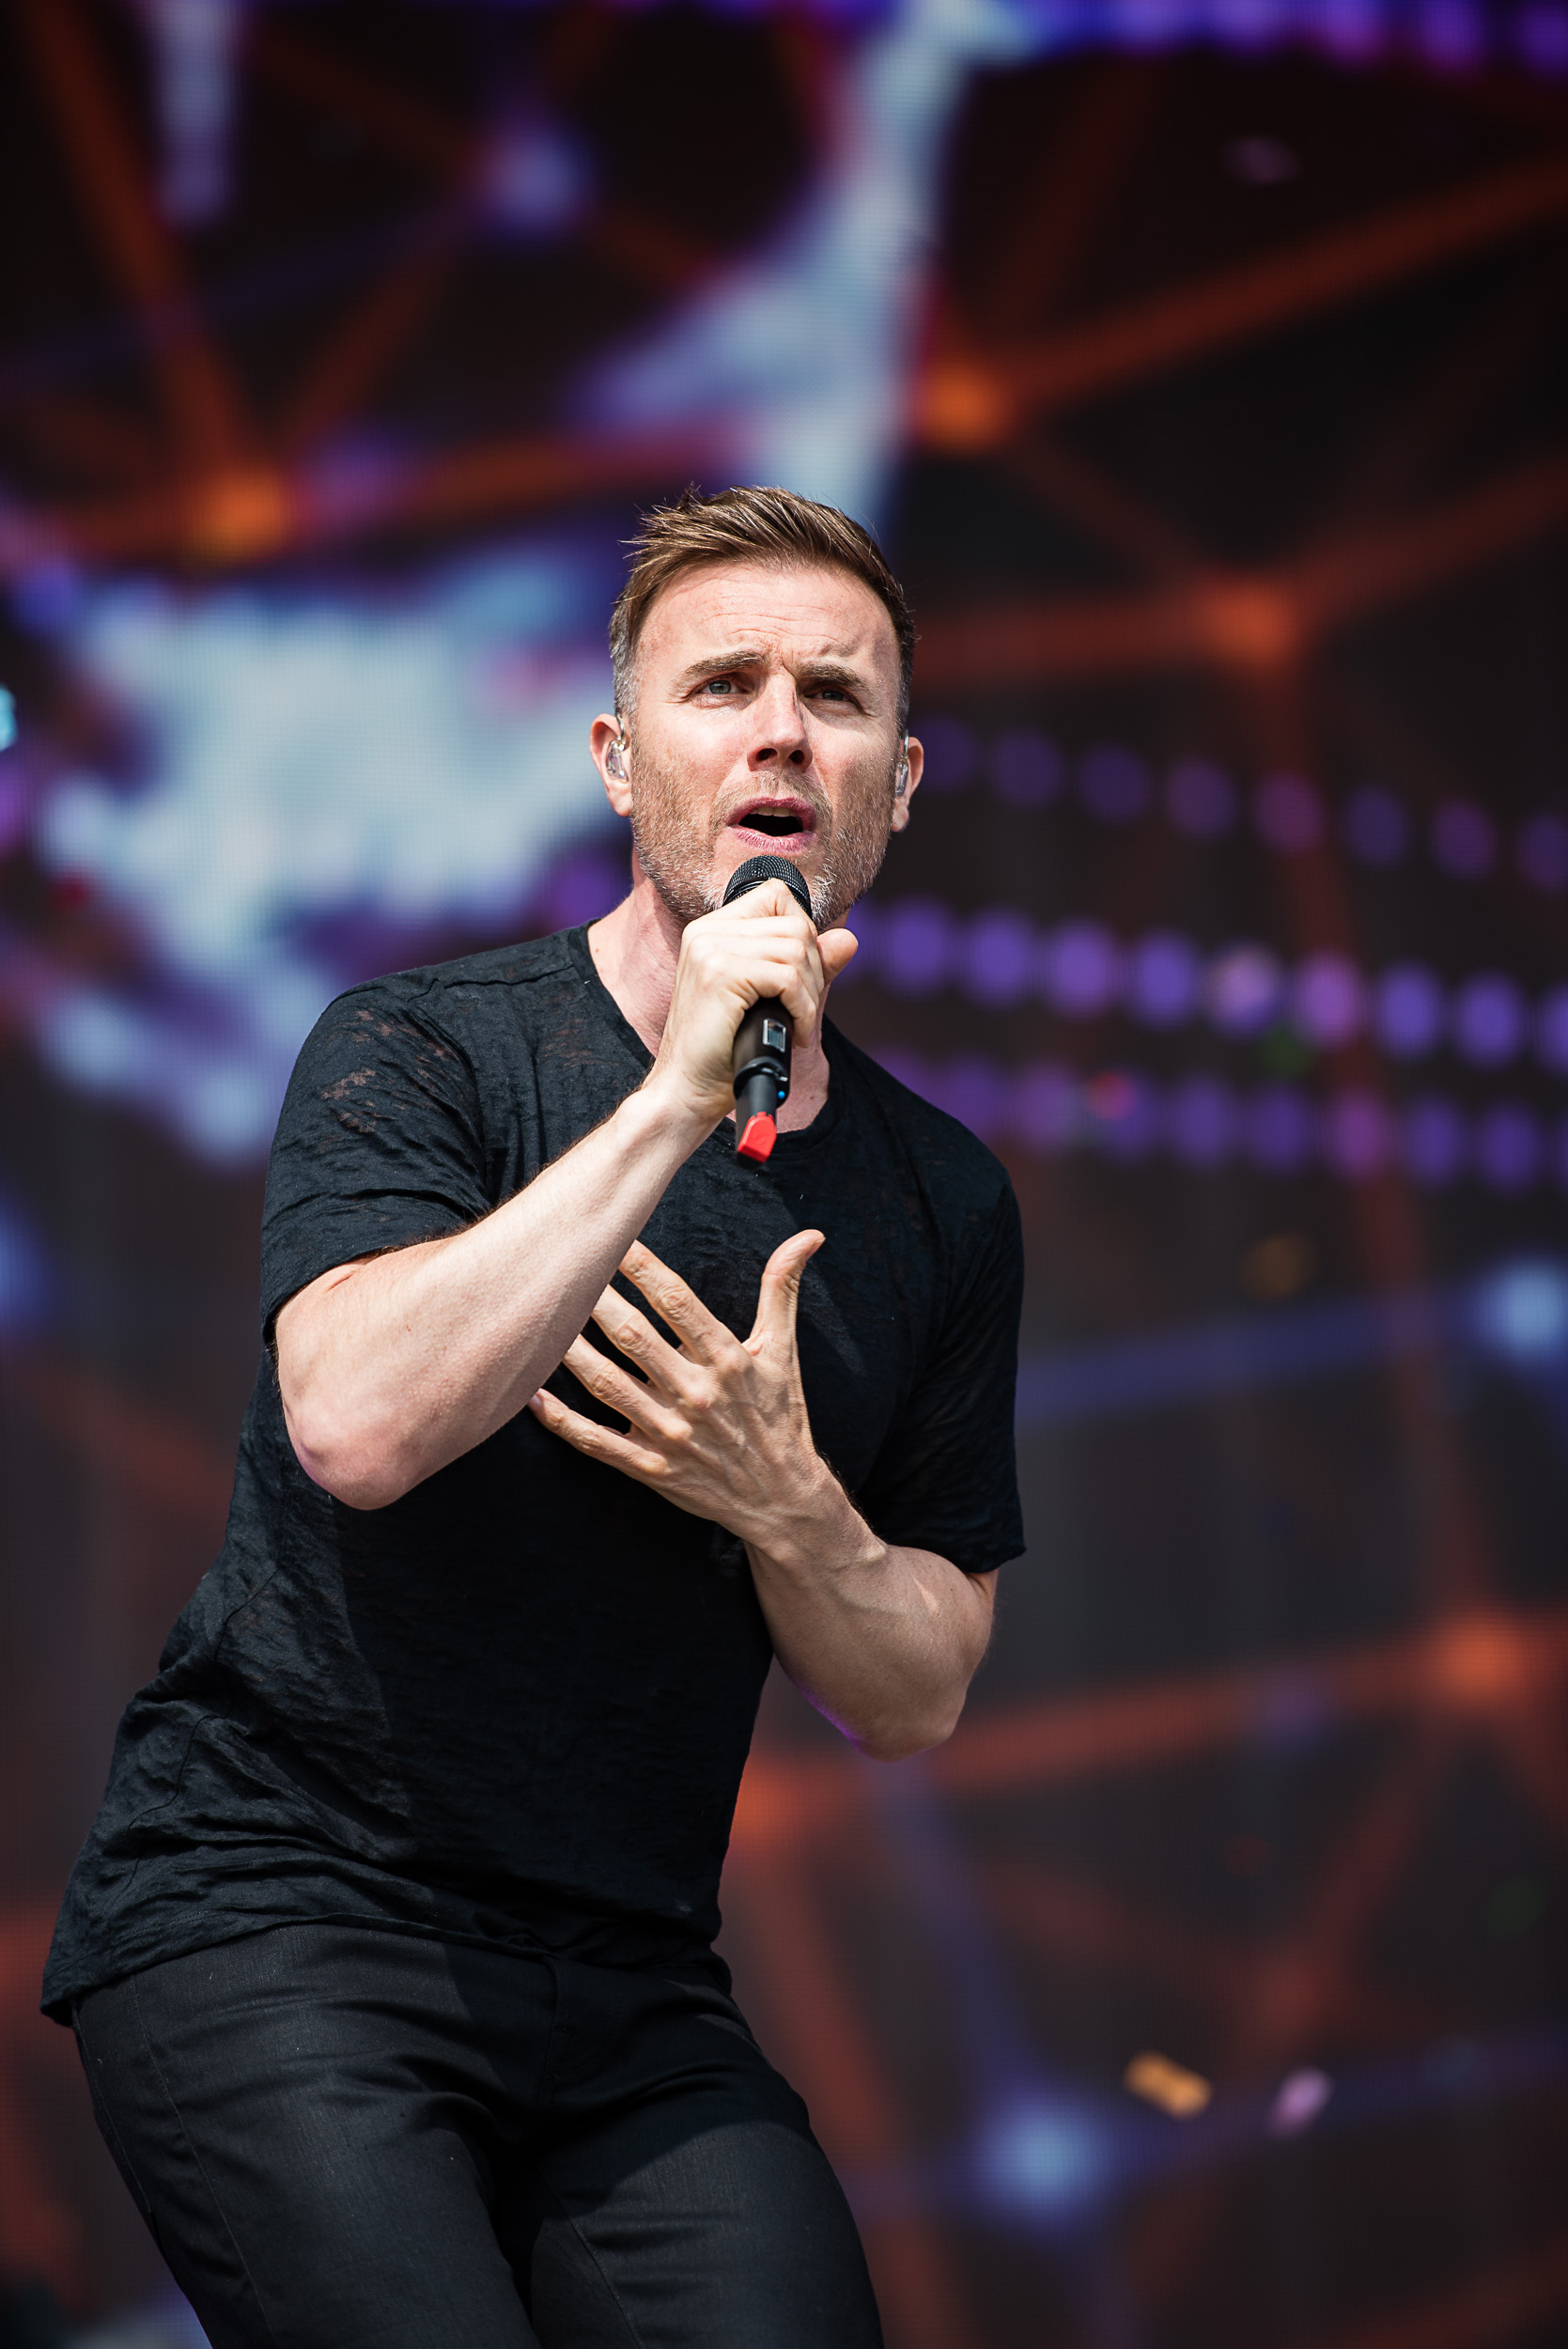 Gary Barlow at Radio One Big Weekend.